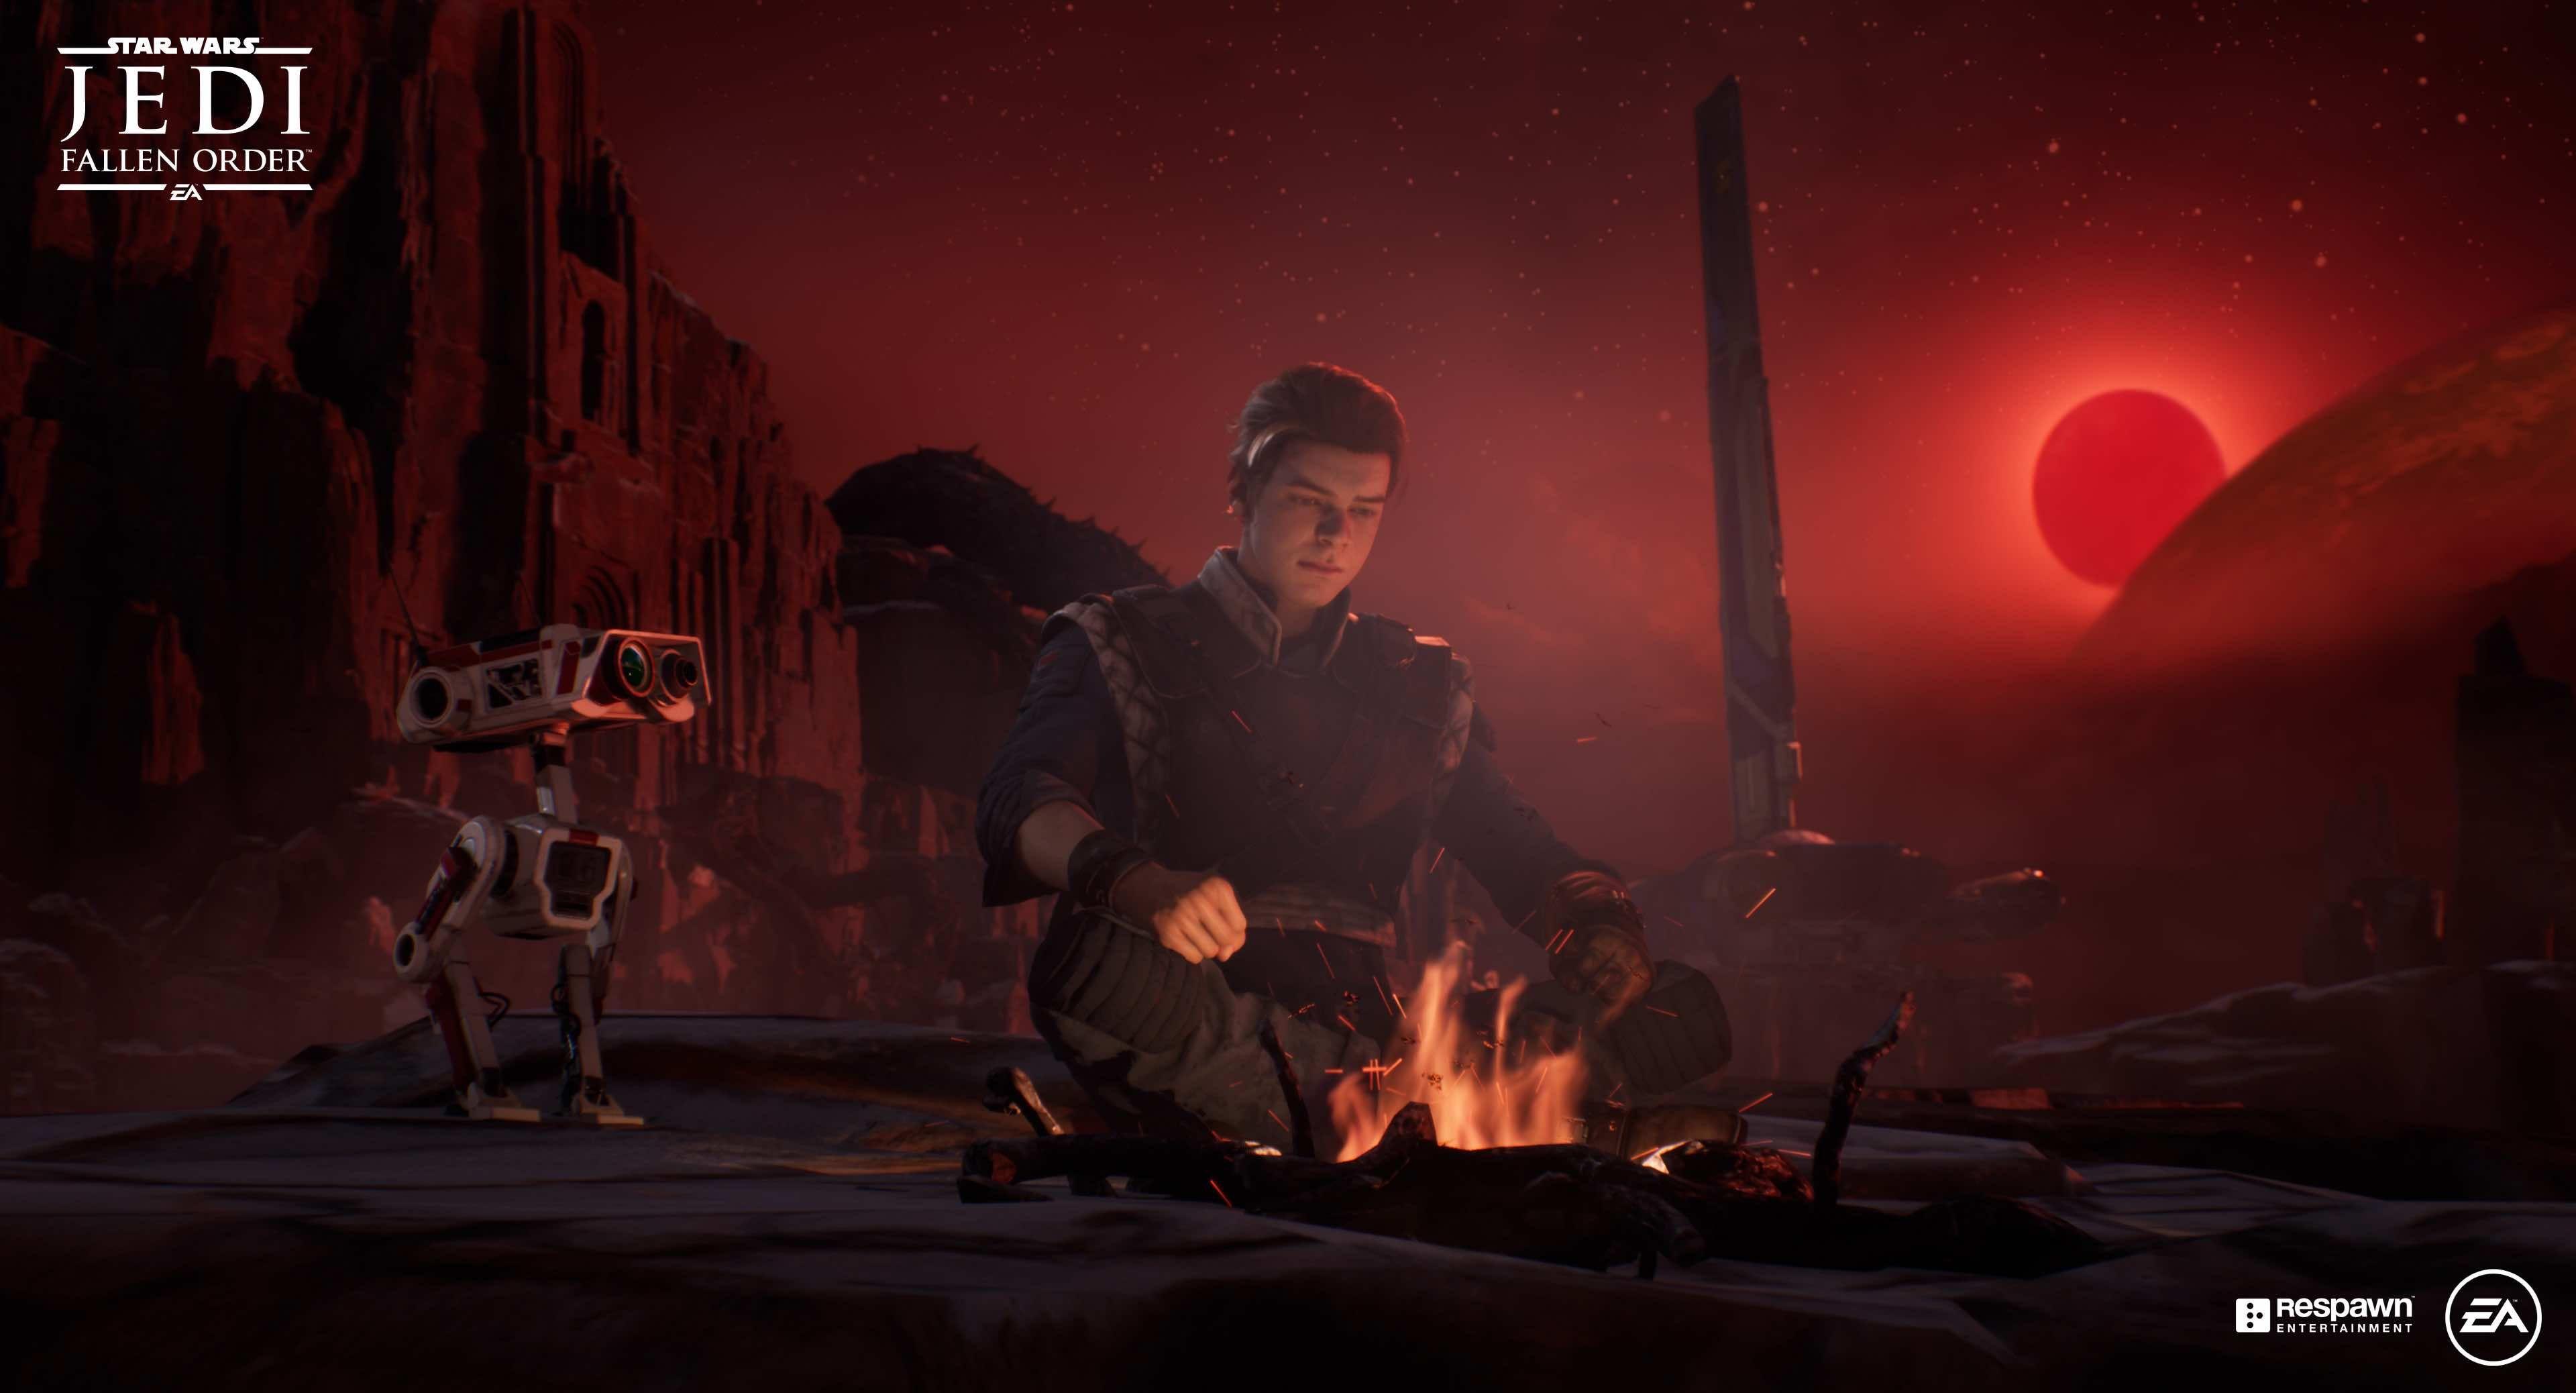 Cal's droid friend BD-1 will be brought to life in Star Wars: Jedi Fallen Order by sound designer Ben Burtt.